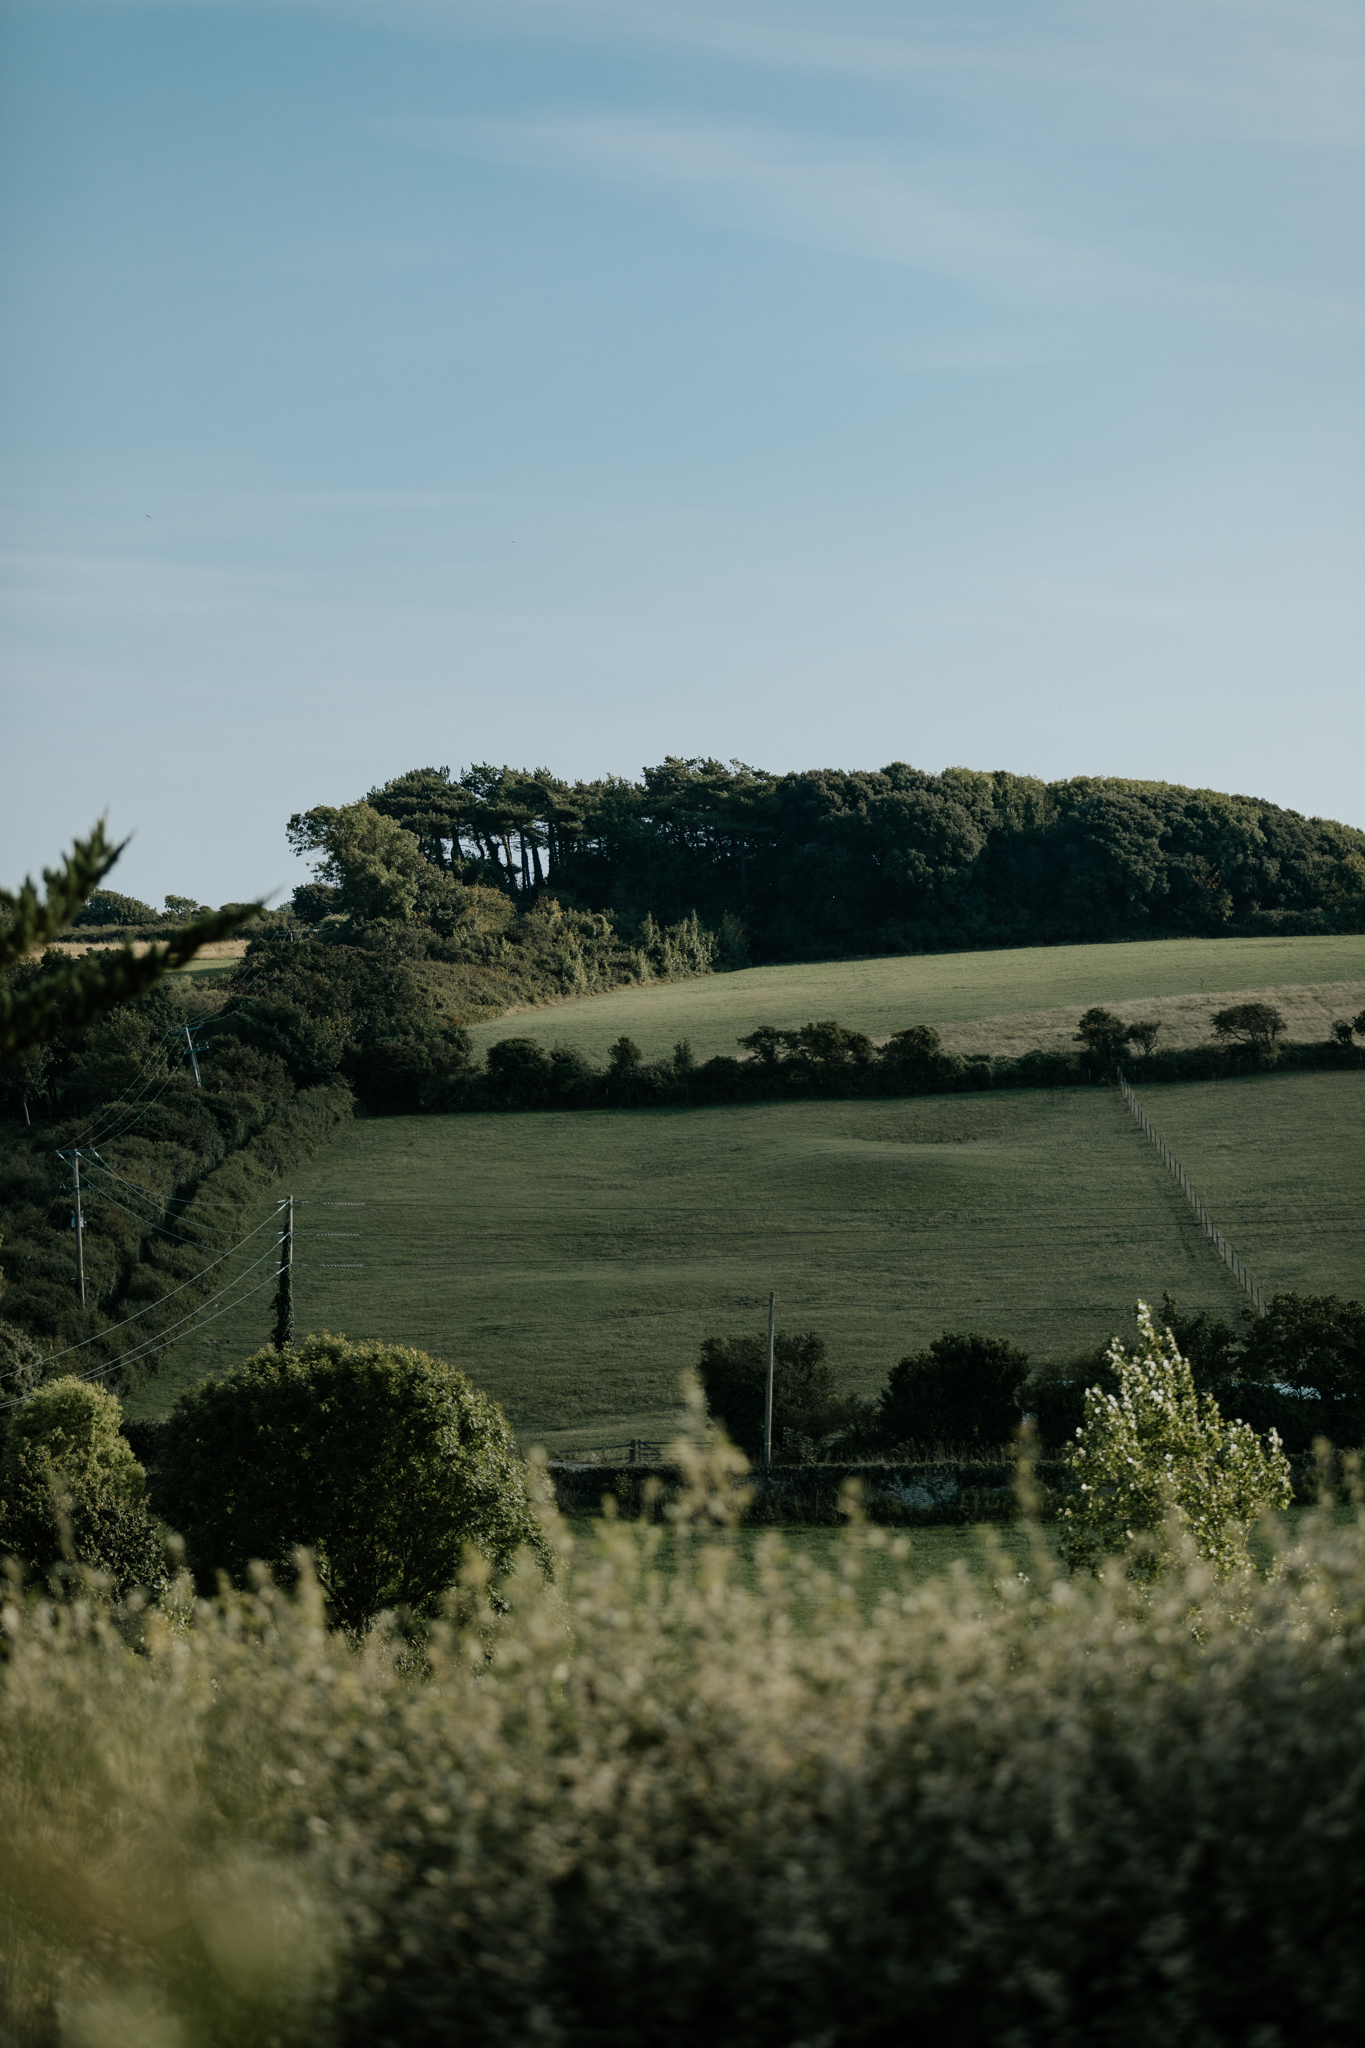 Natalie Skoric Photography - England Travel v2-14.jpg